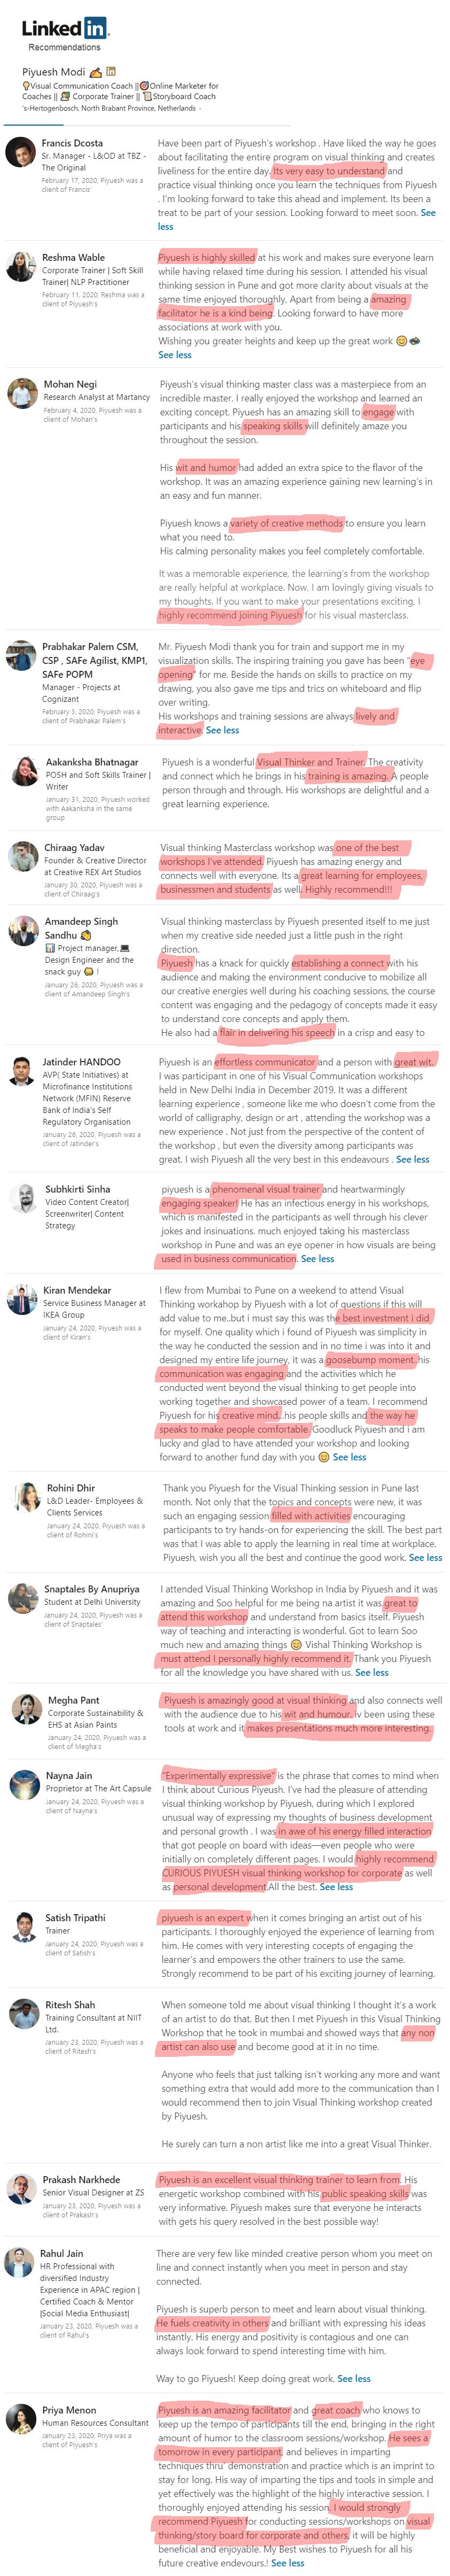 Linkedin-Recommendation-for-Piyuesh-Modi